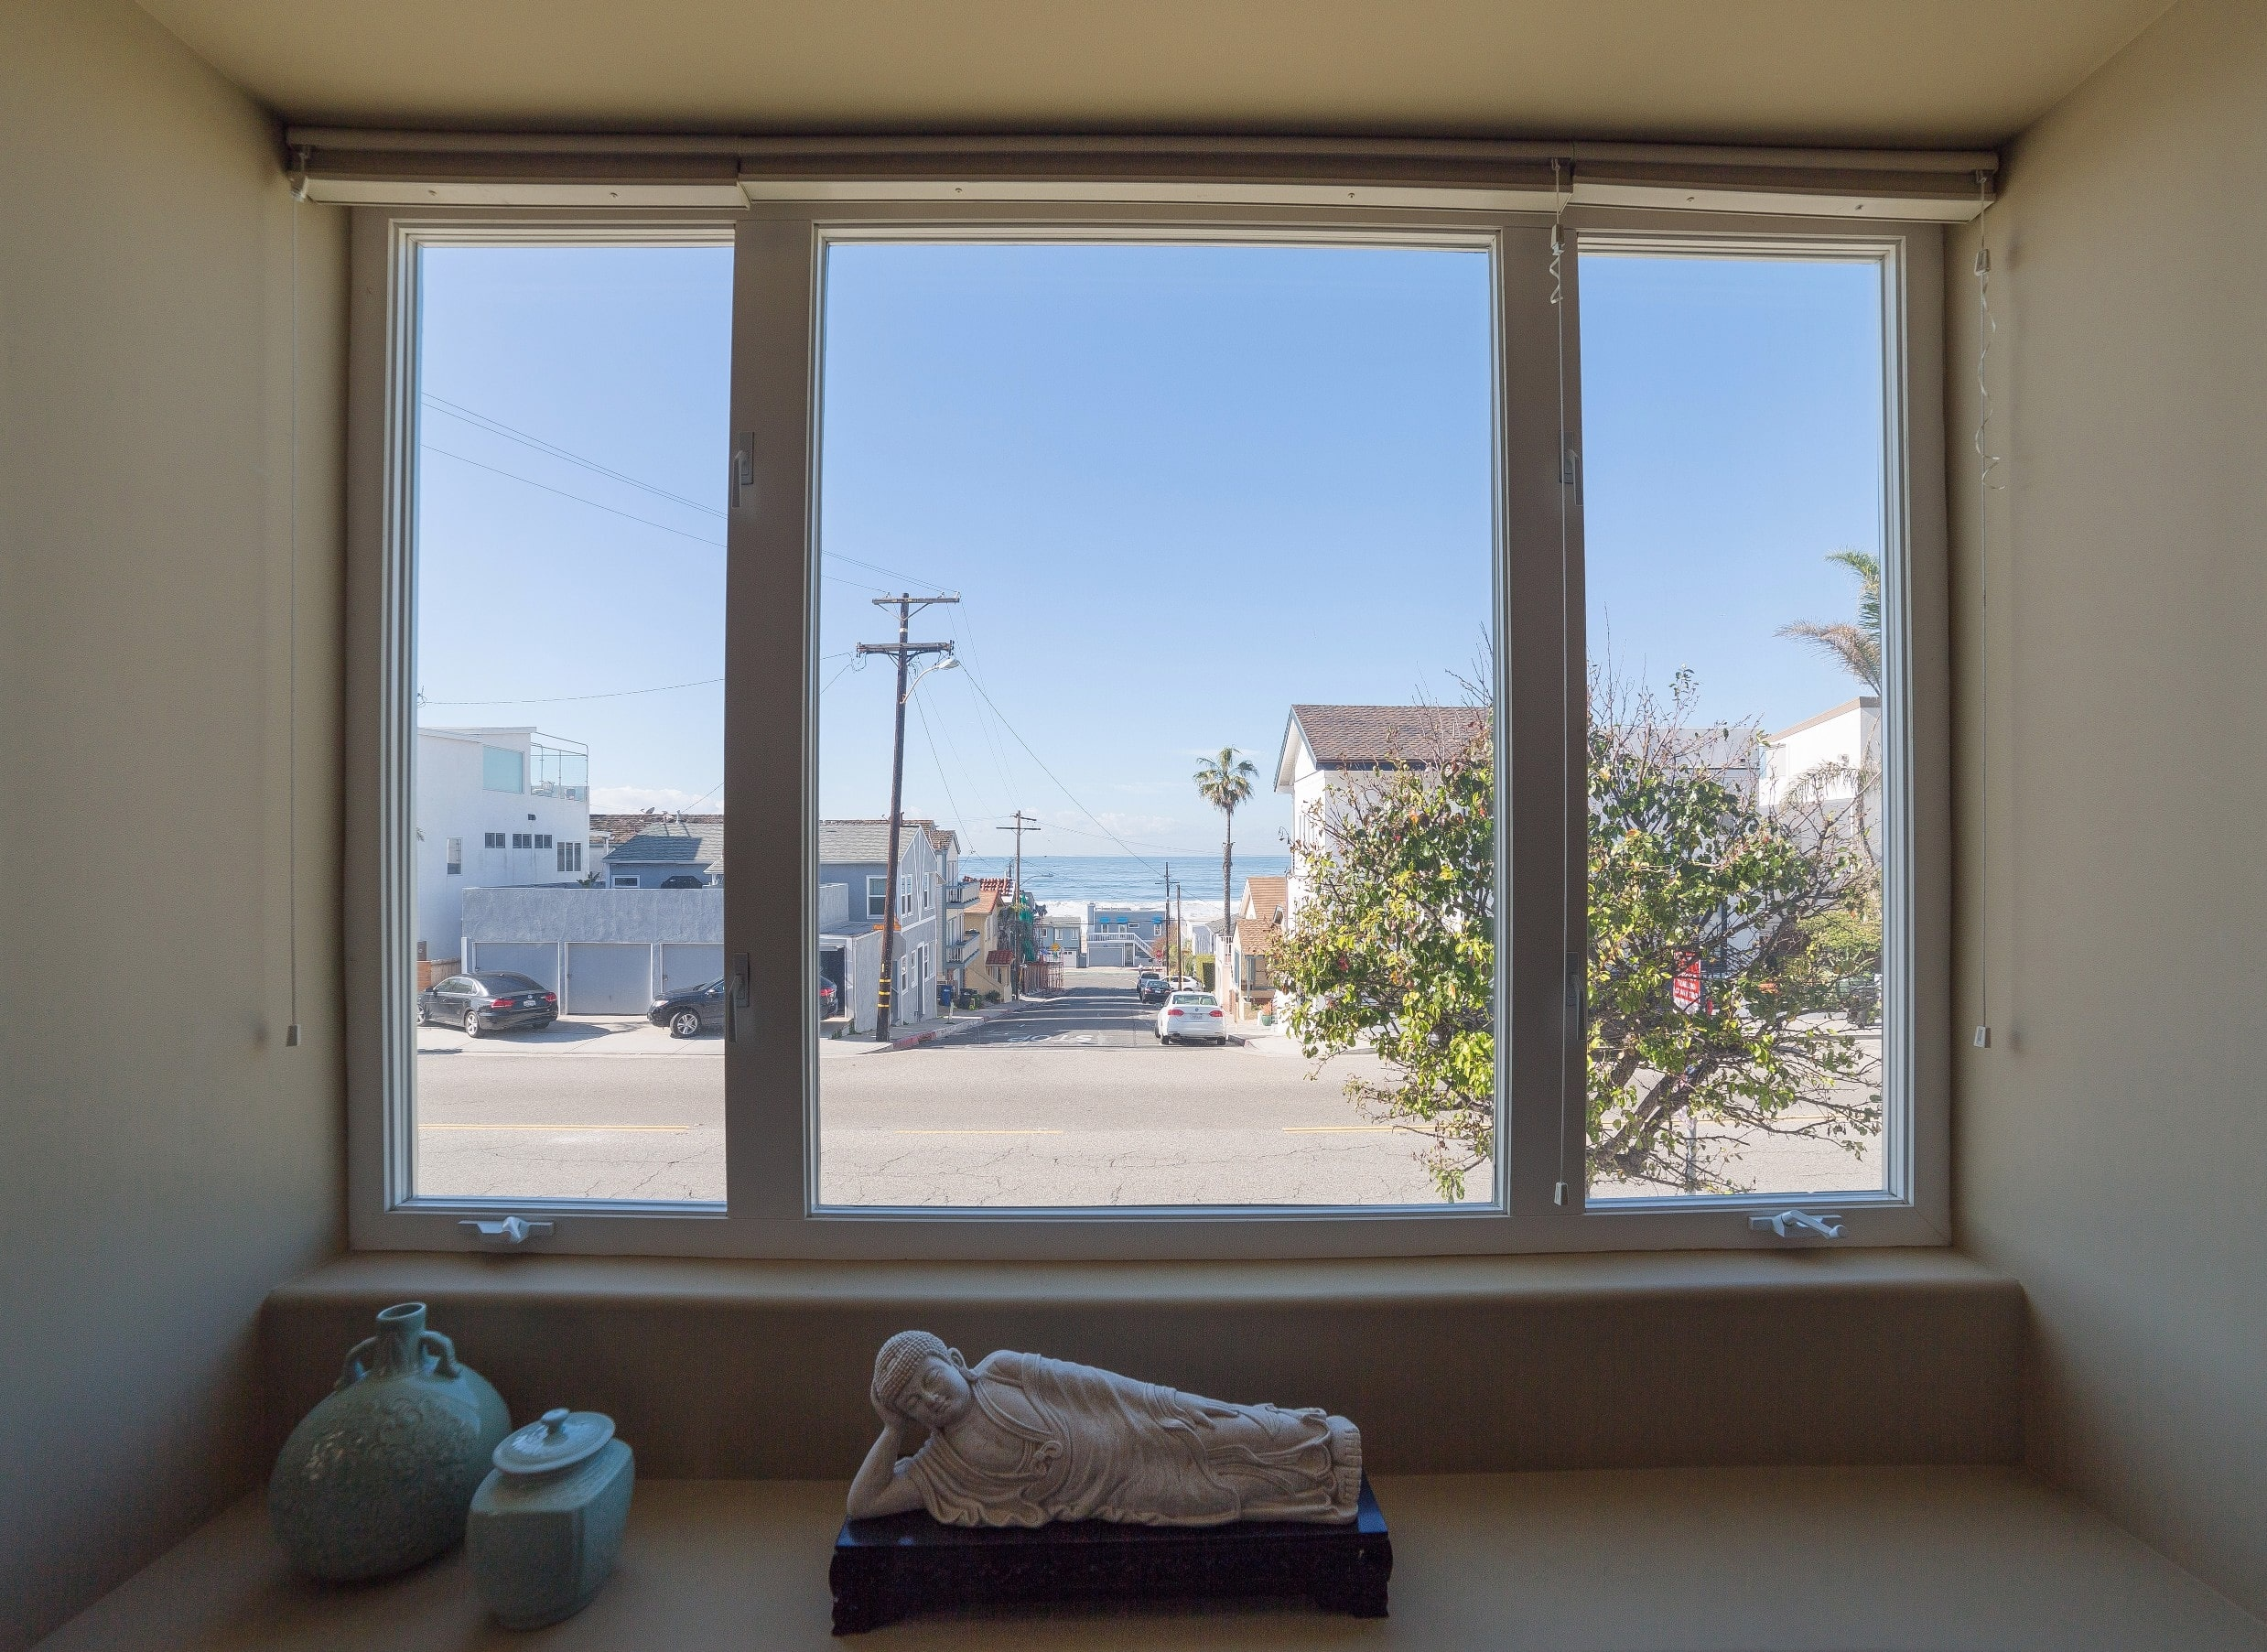 MB Townhouse Window